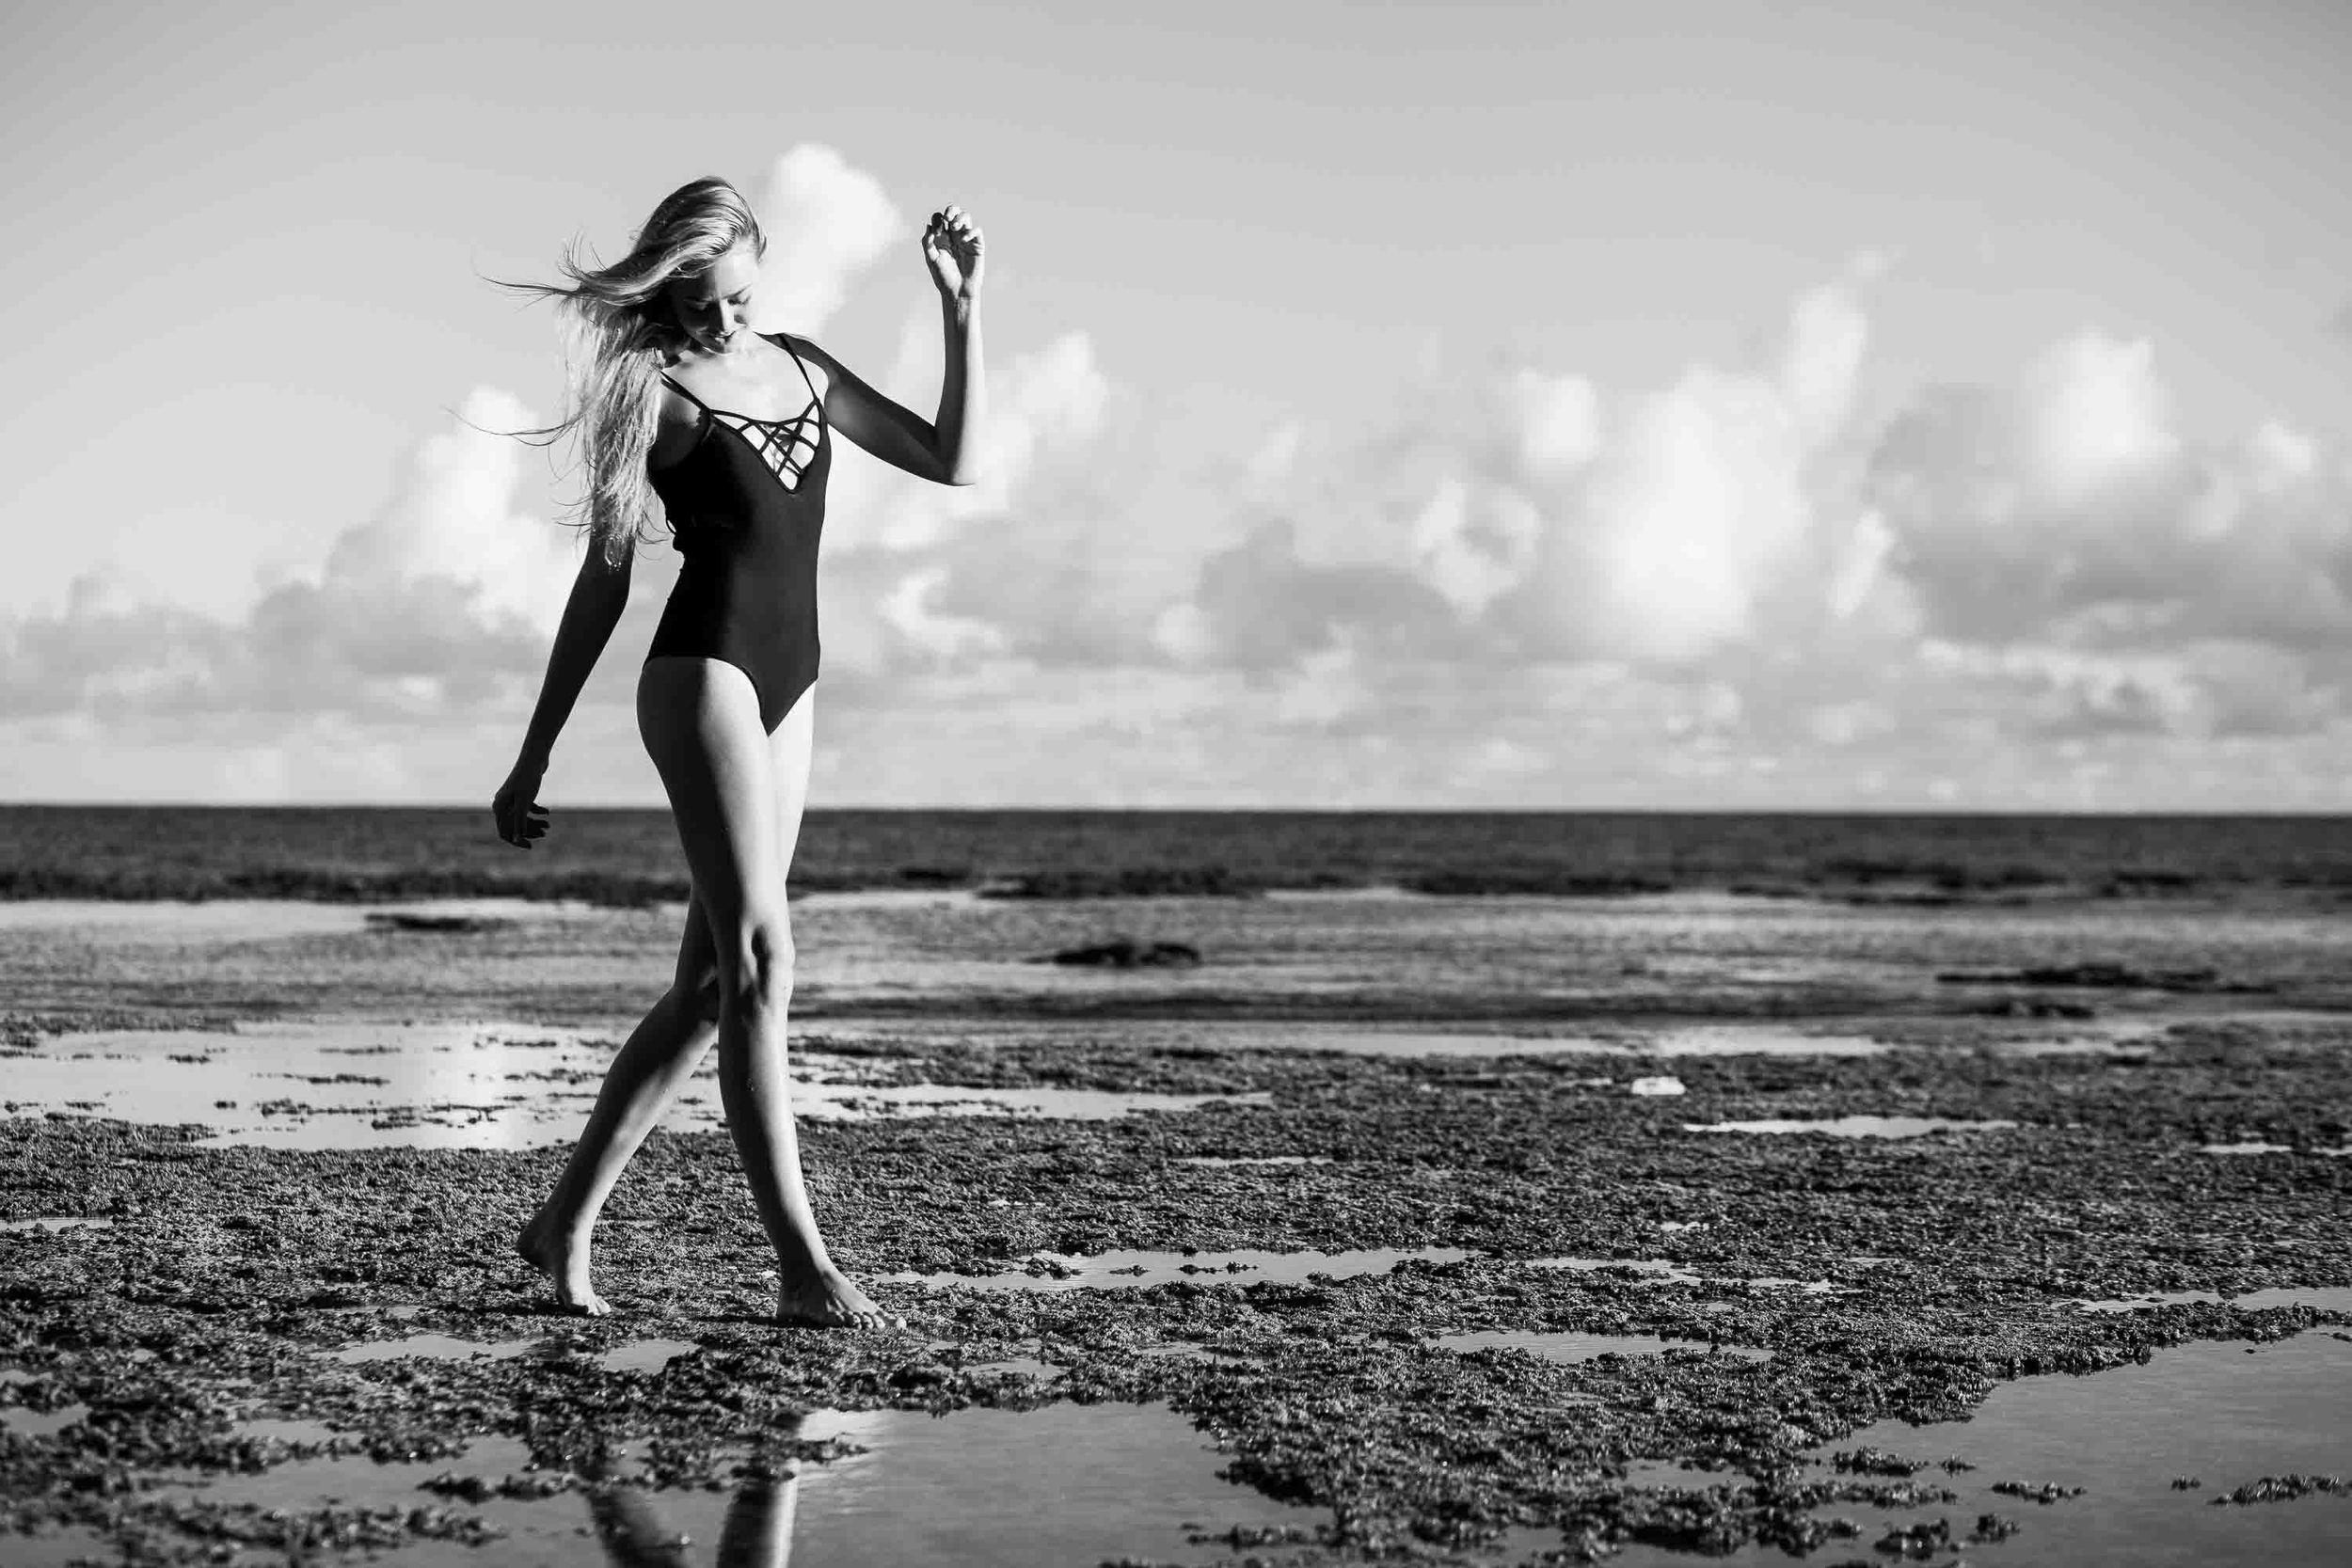 bryce-johnson-issademar-swimwear-gabby harrington-8.jpg